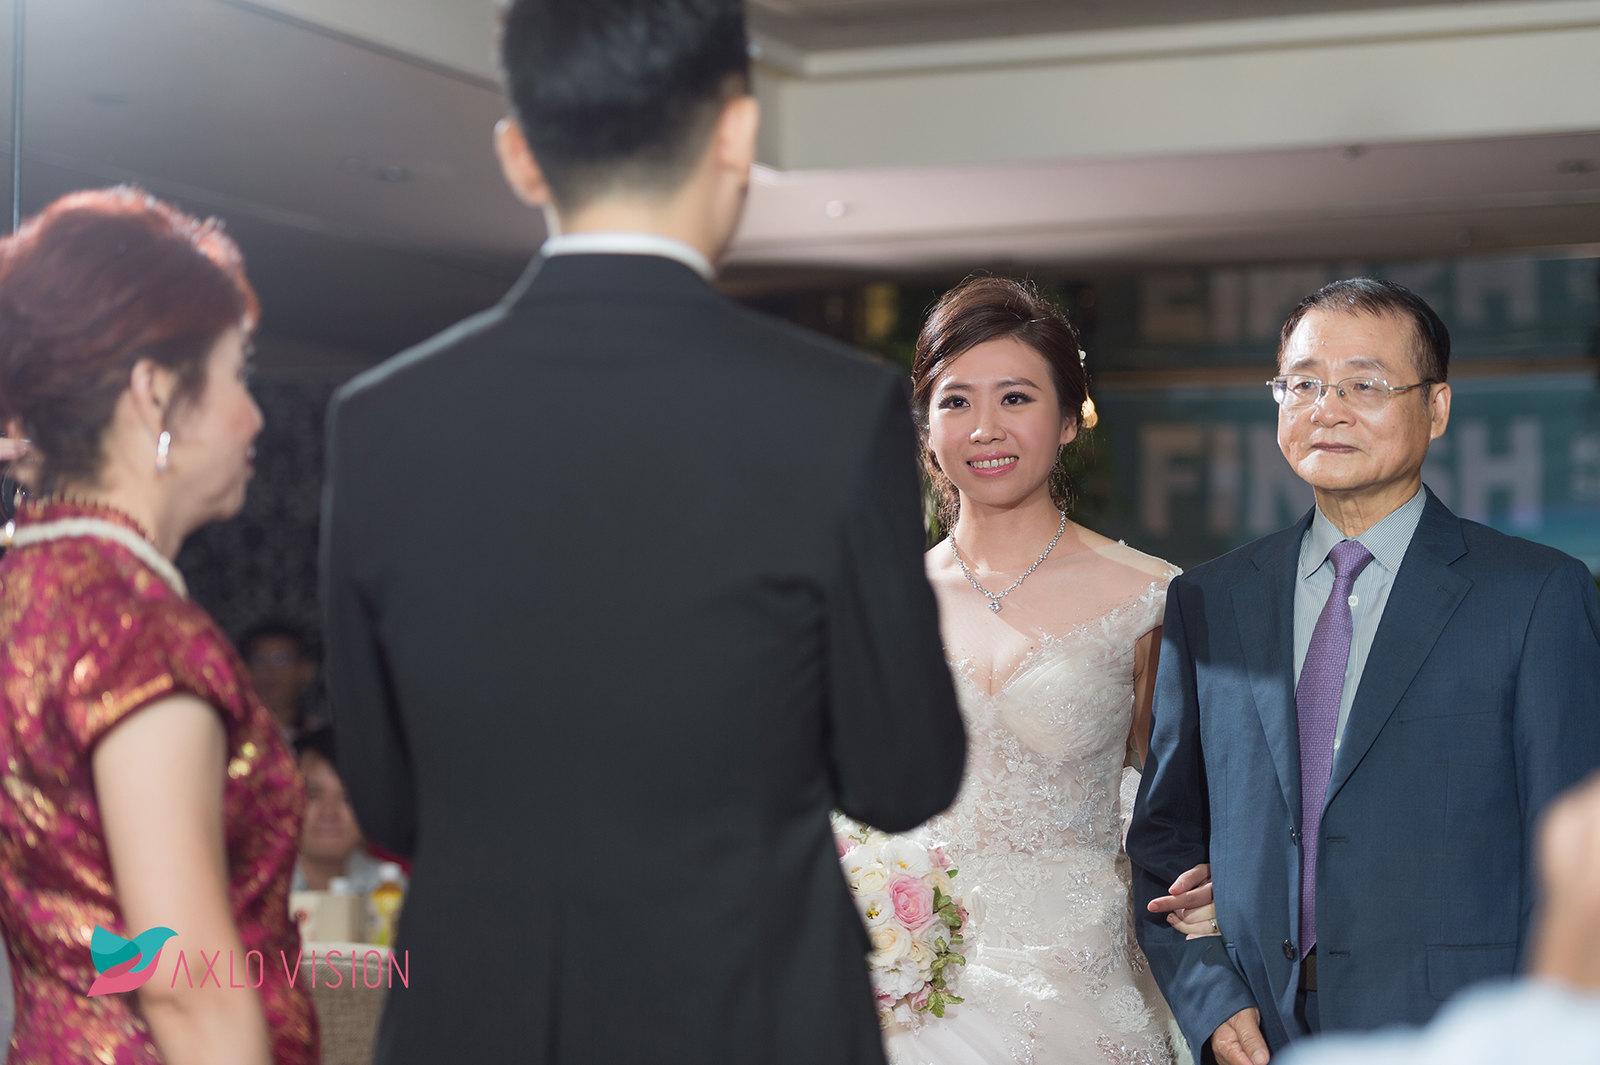 20170916 WeddingDay_143